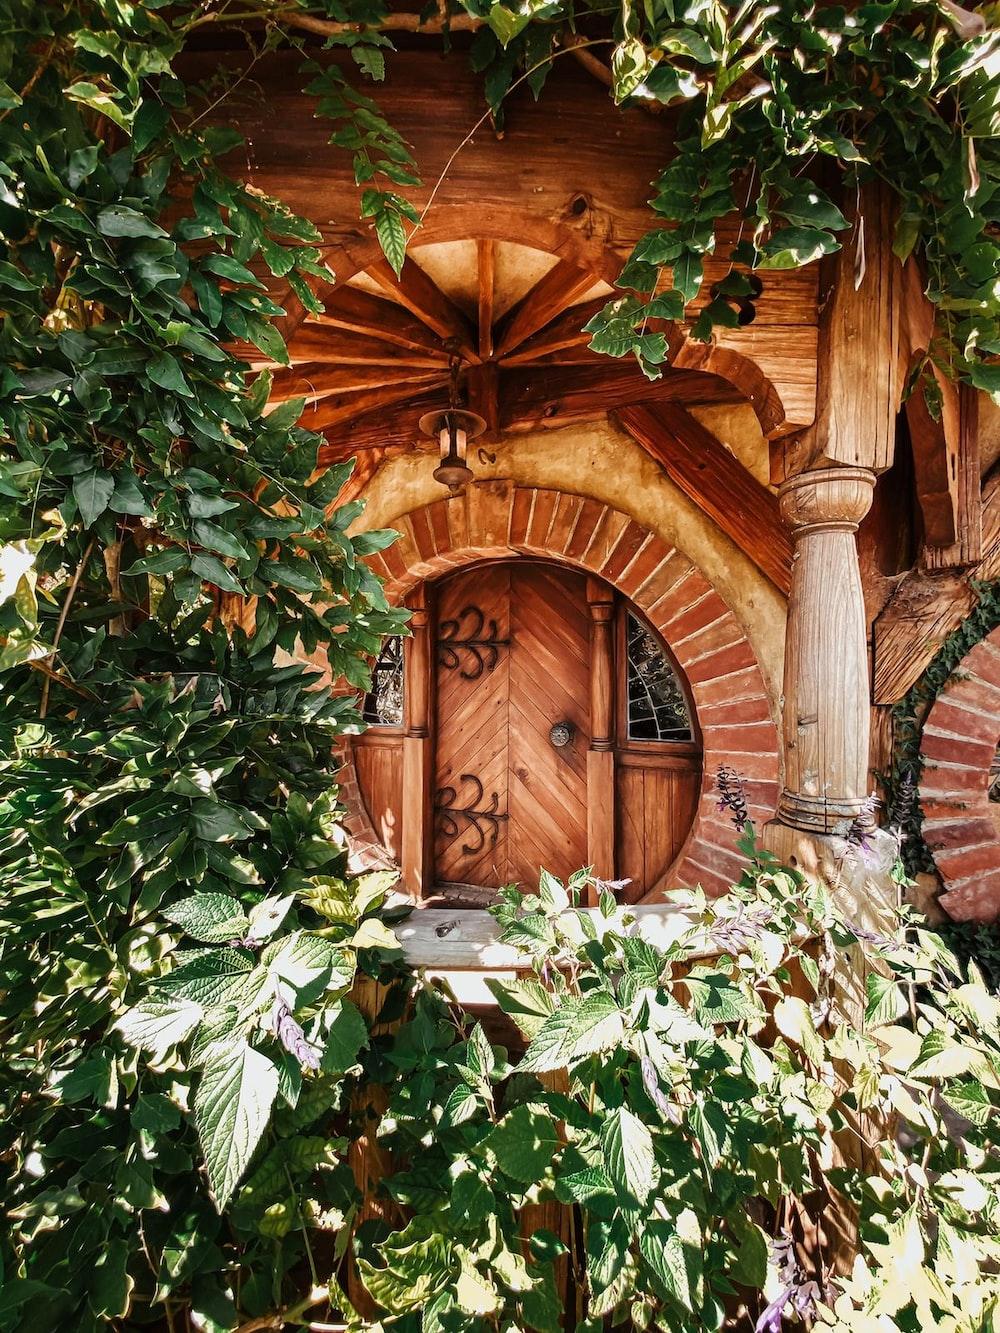 brown wooden door in brown and green leaves